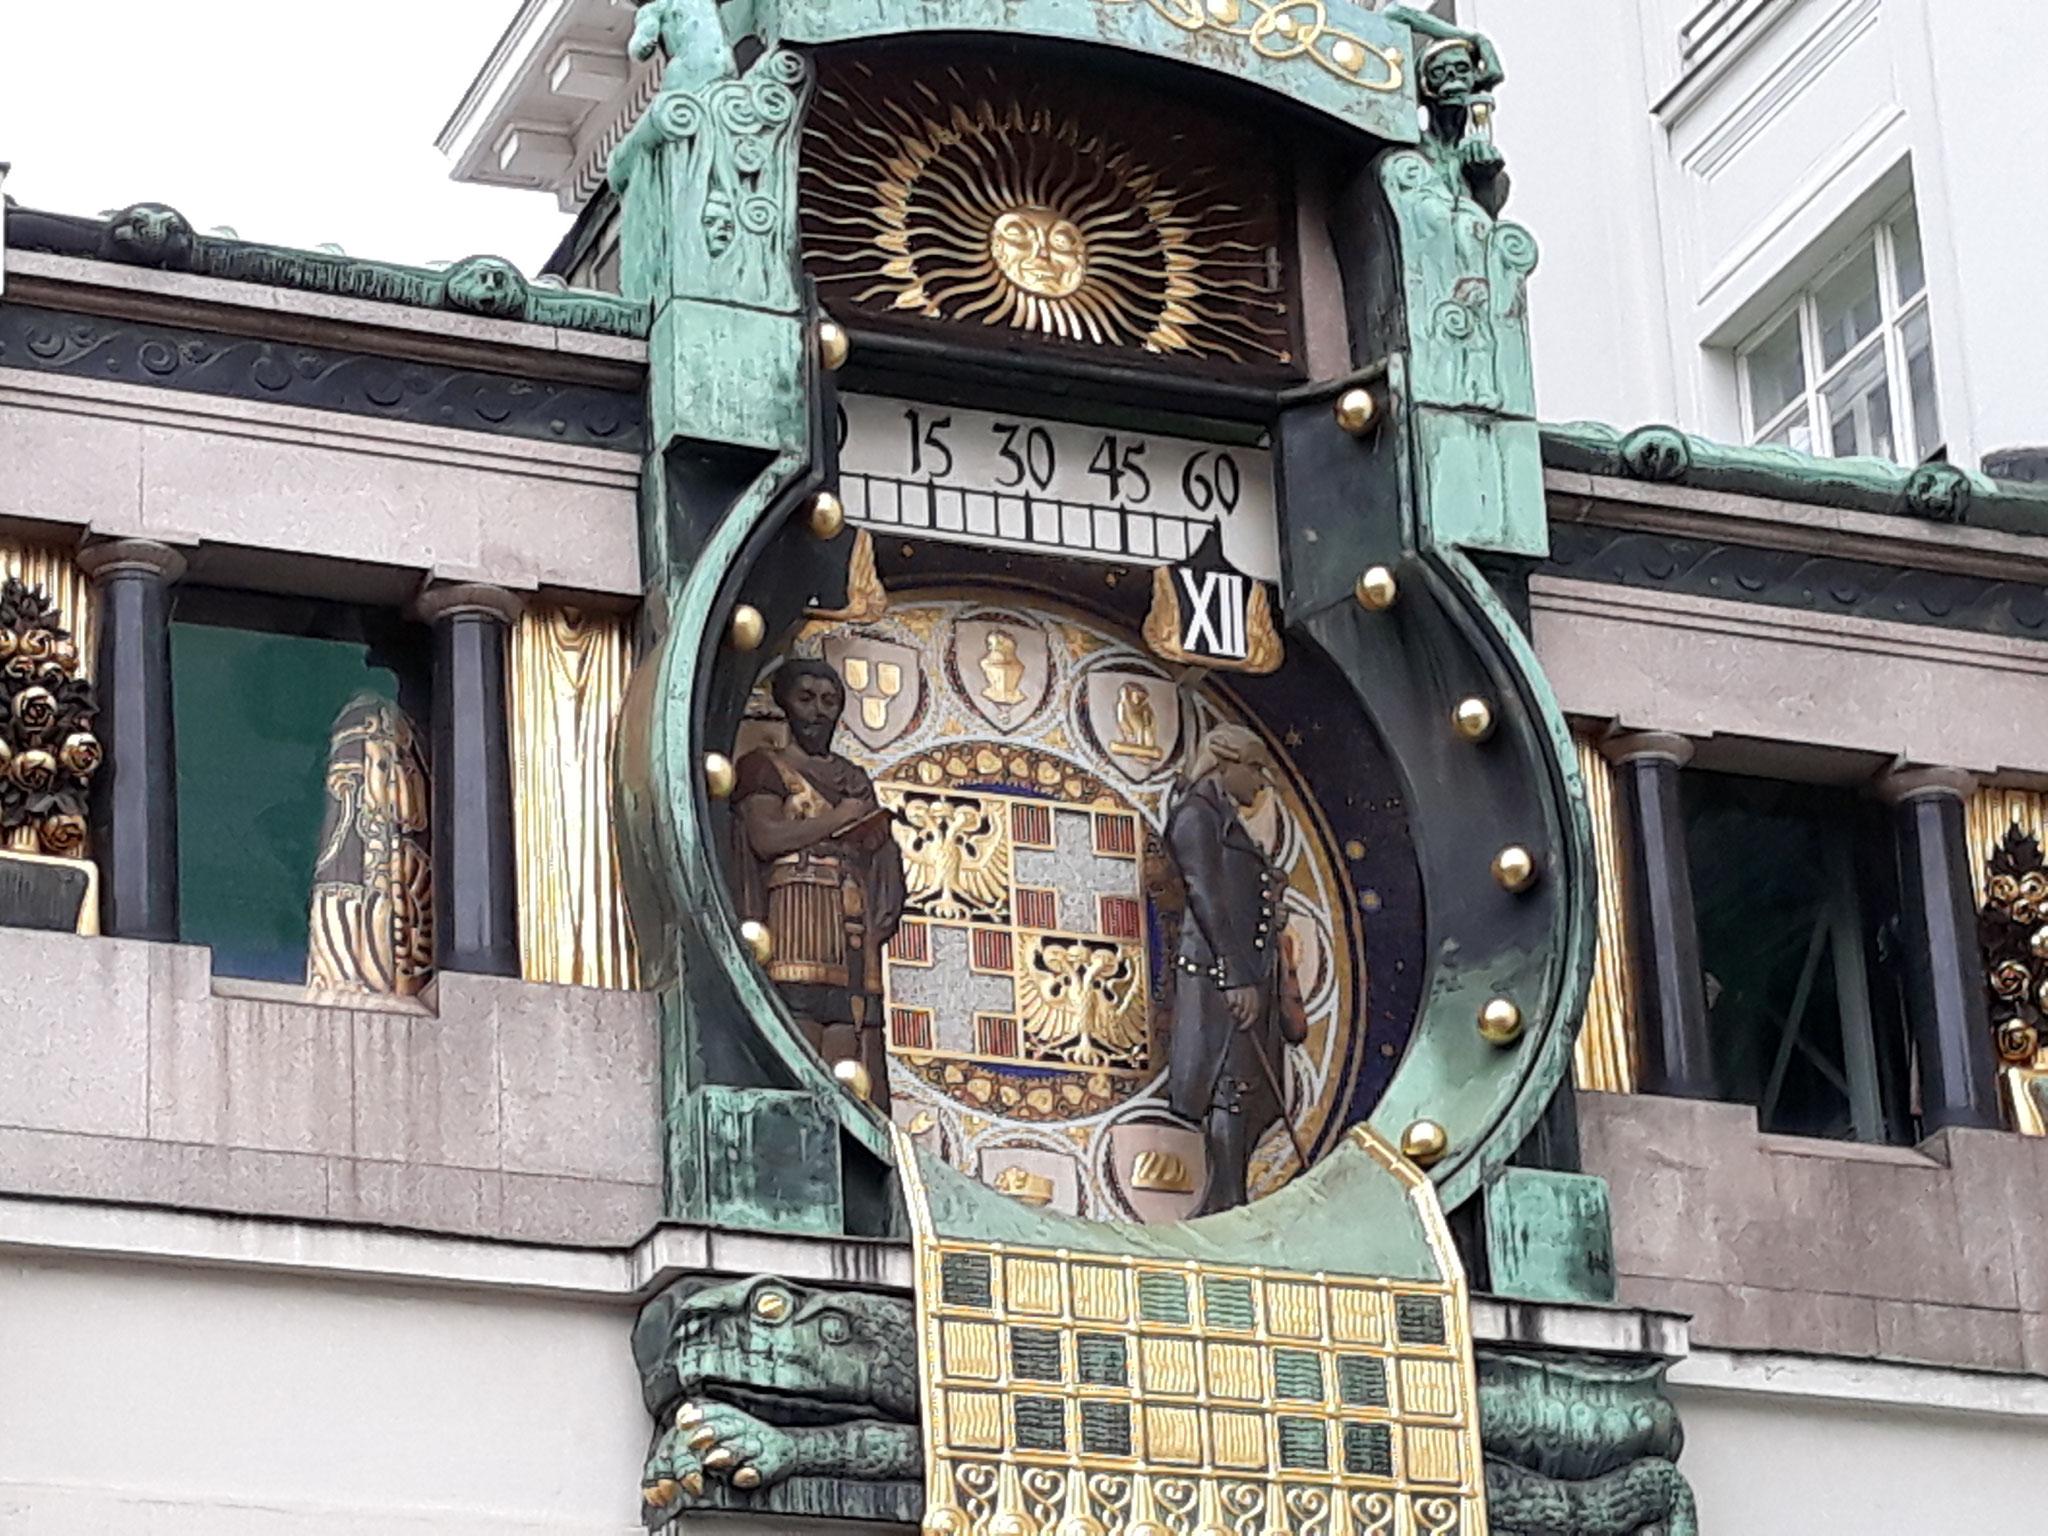 Anker Uhr Wien - Marc Aurel